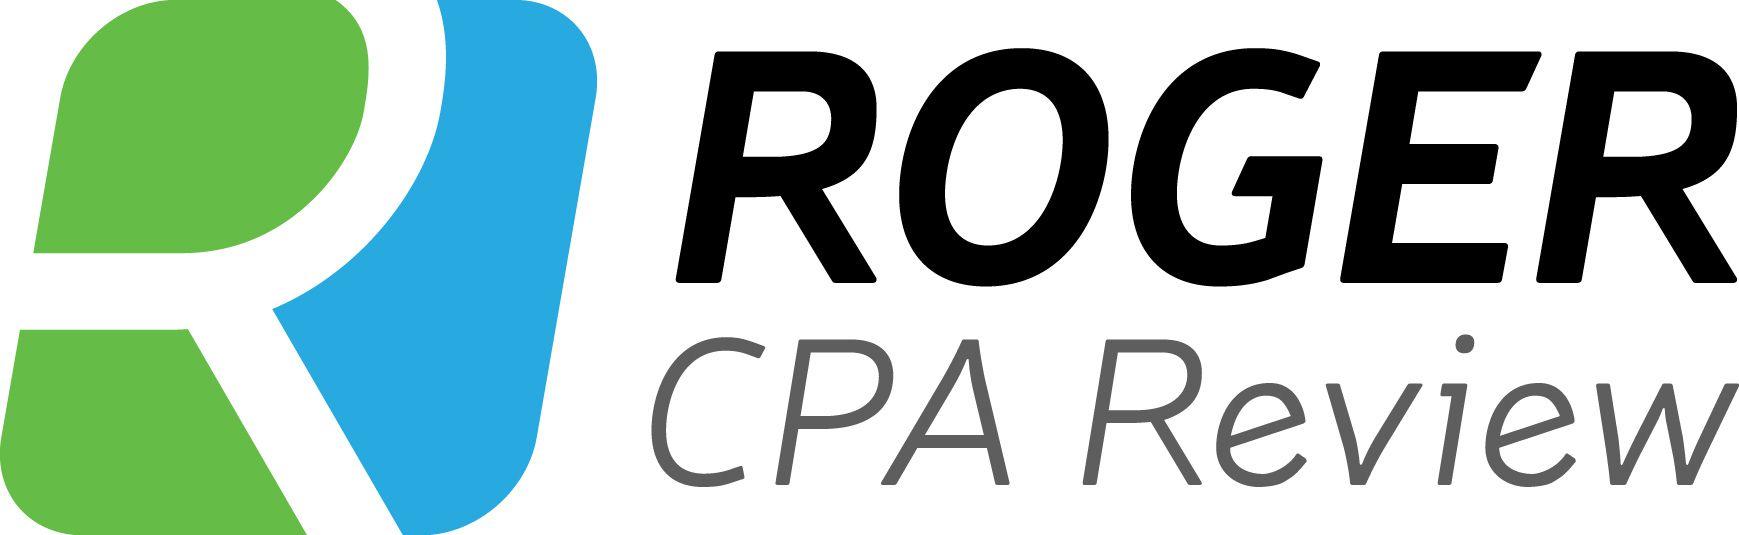 Revisión de Roger CPA